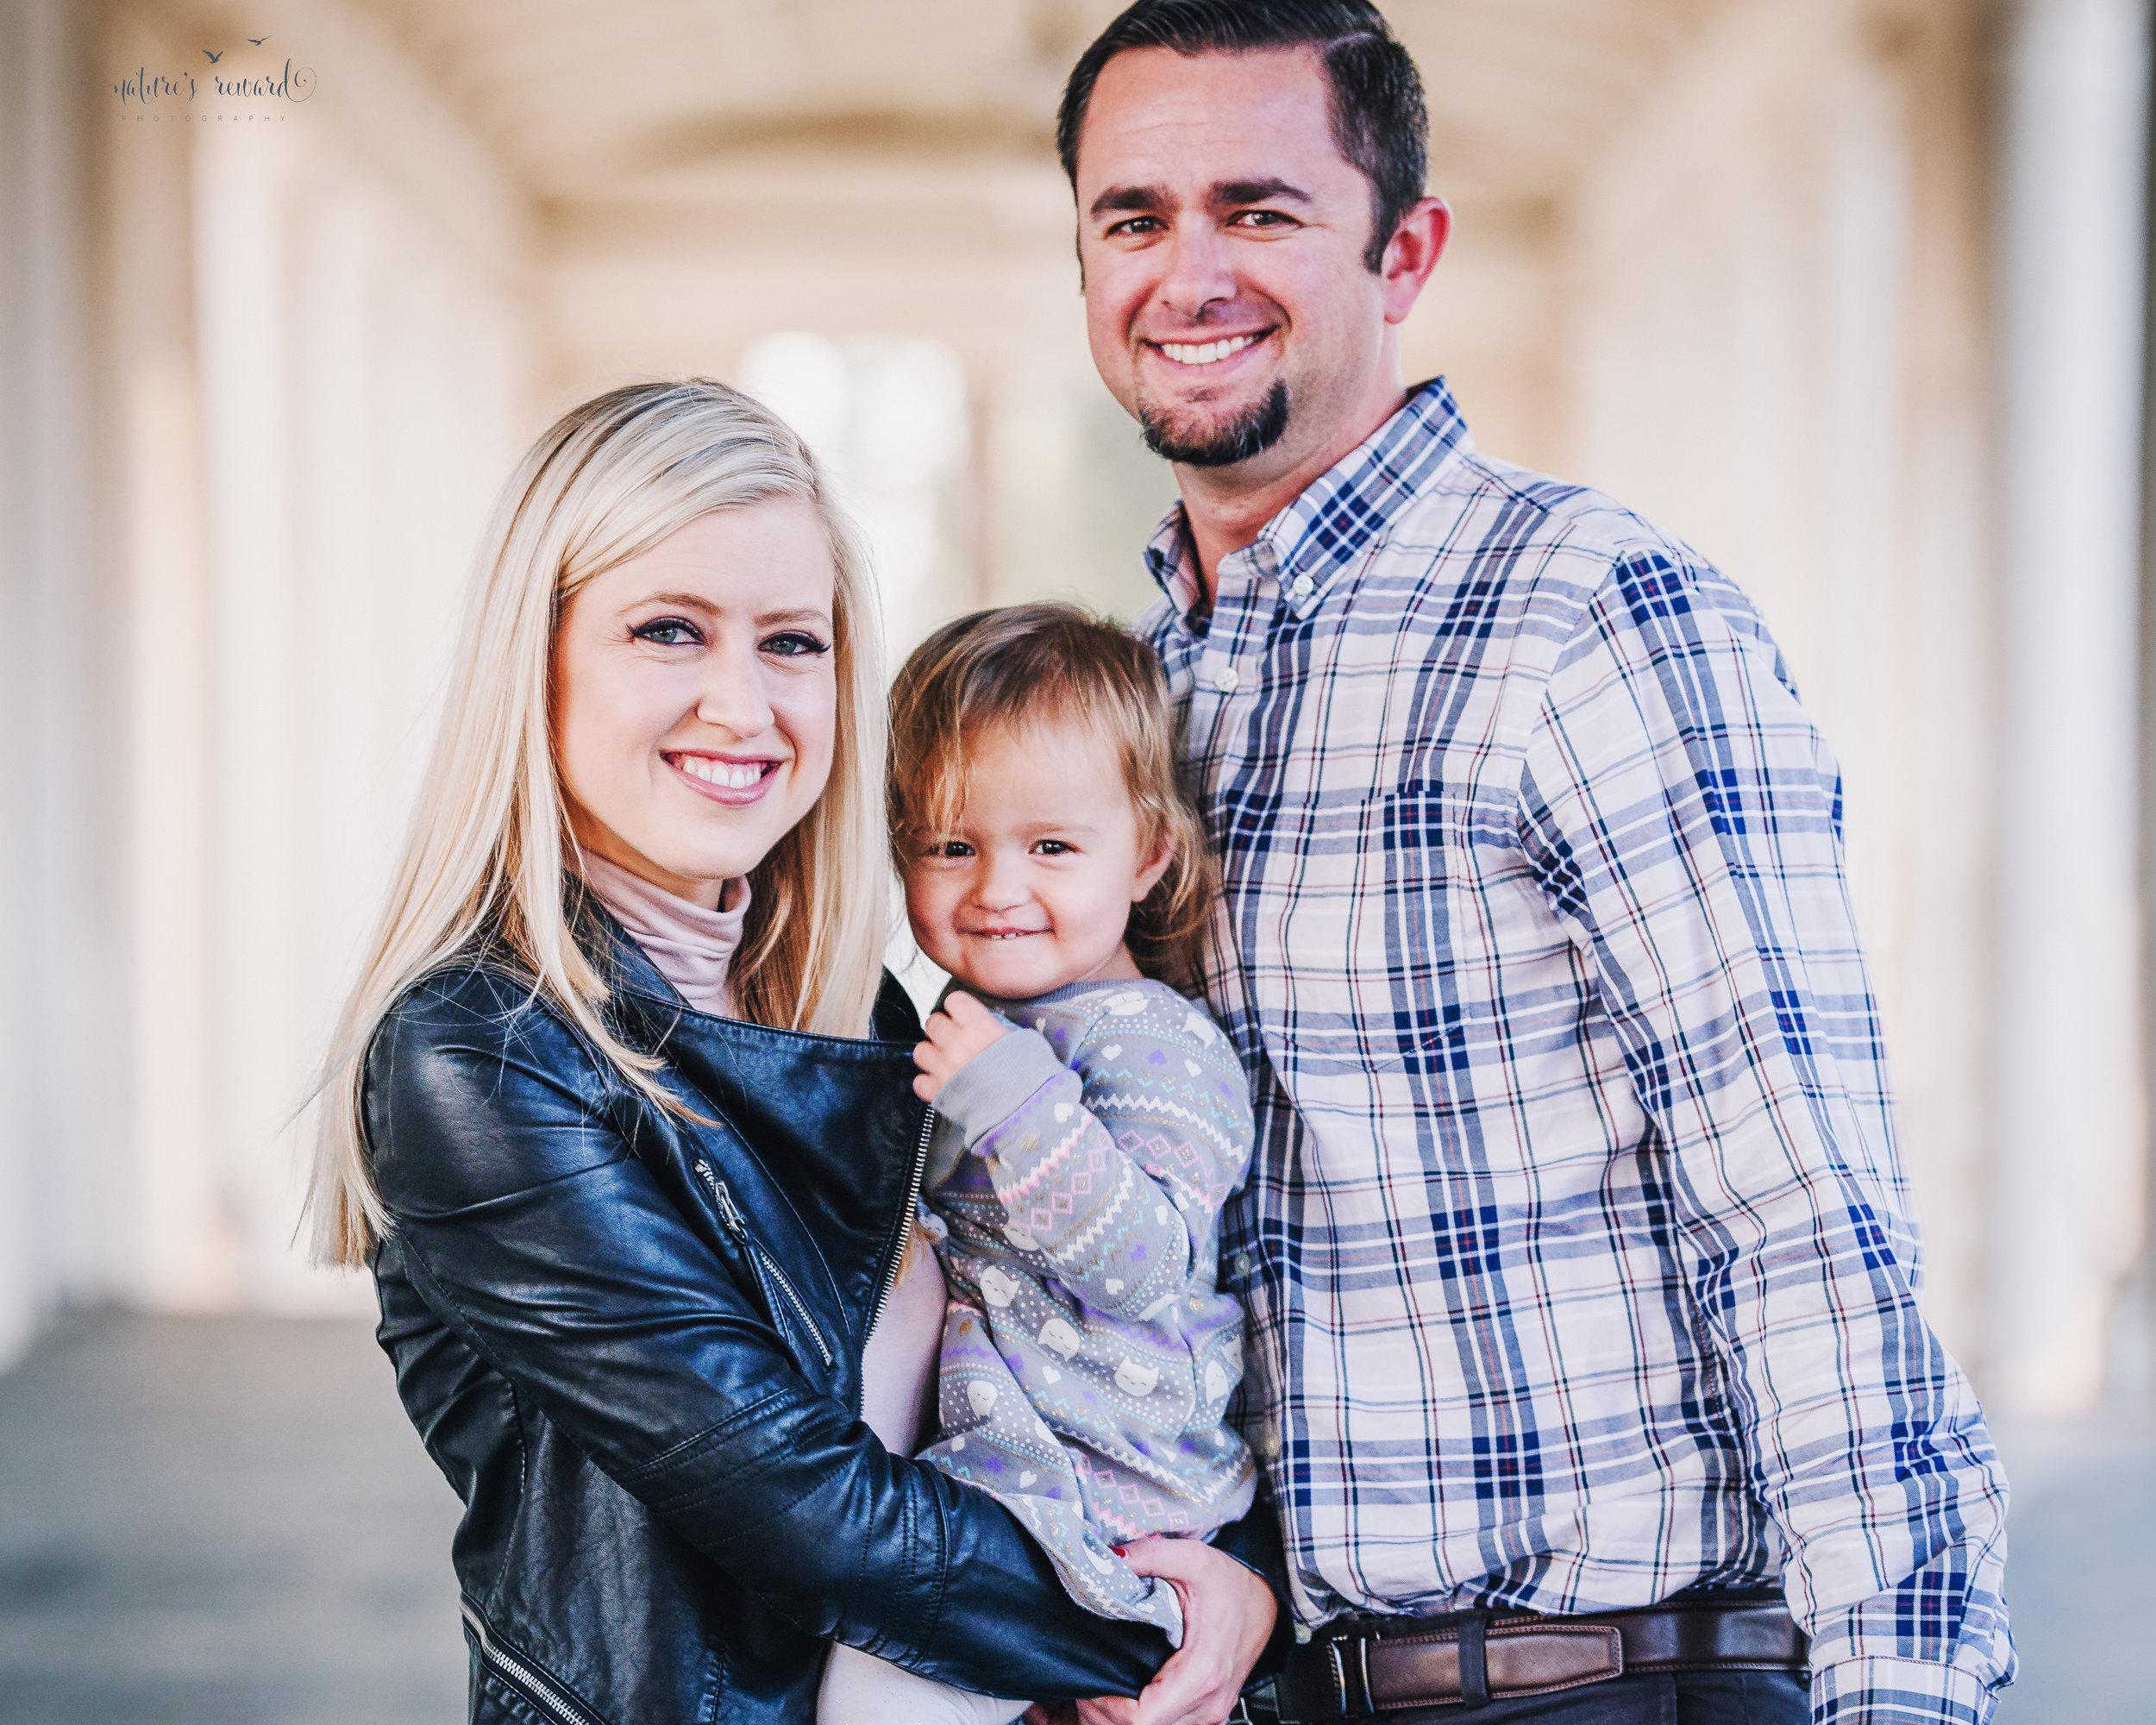 Gorgeous downtown family portrait by Nature's Reward Photography